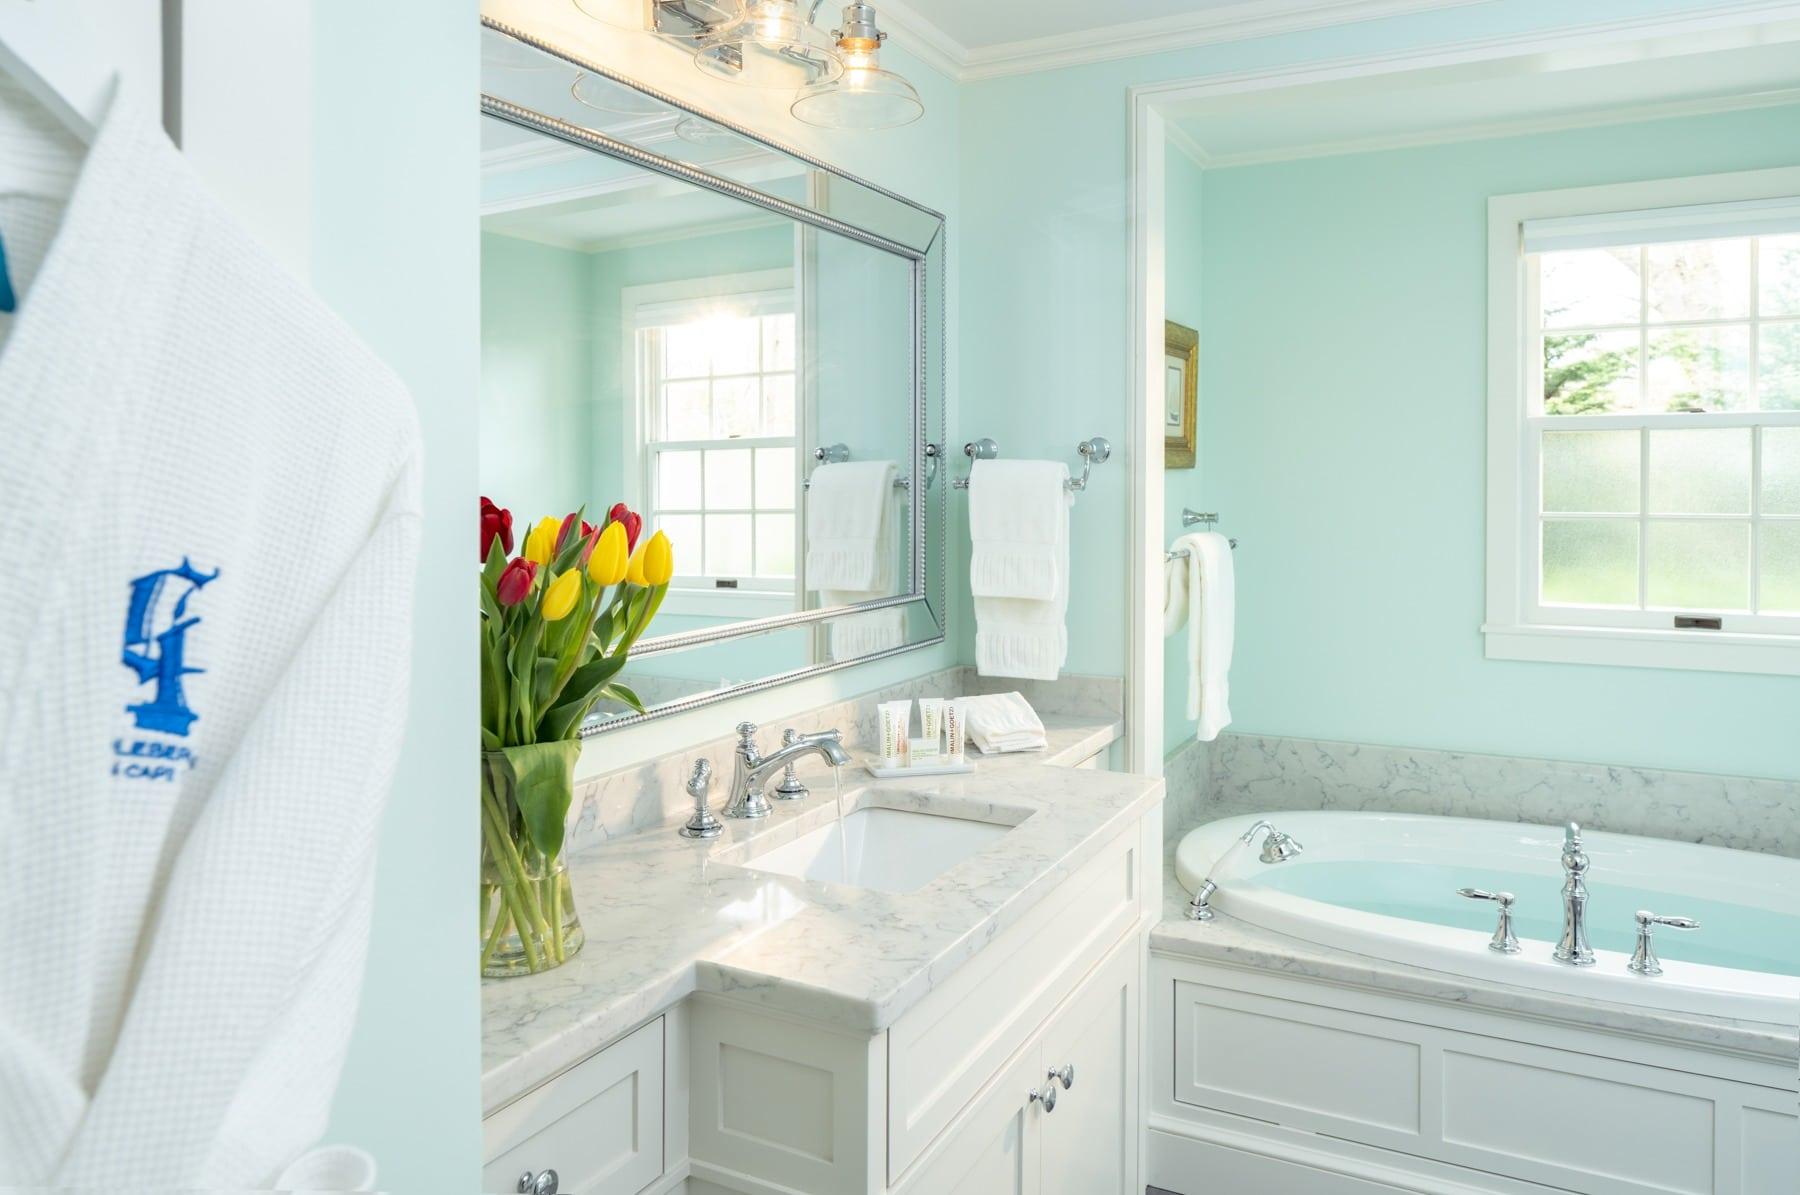 candleberry inn - Guestrooms - Garden Suite (1)